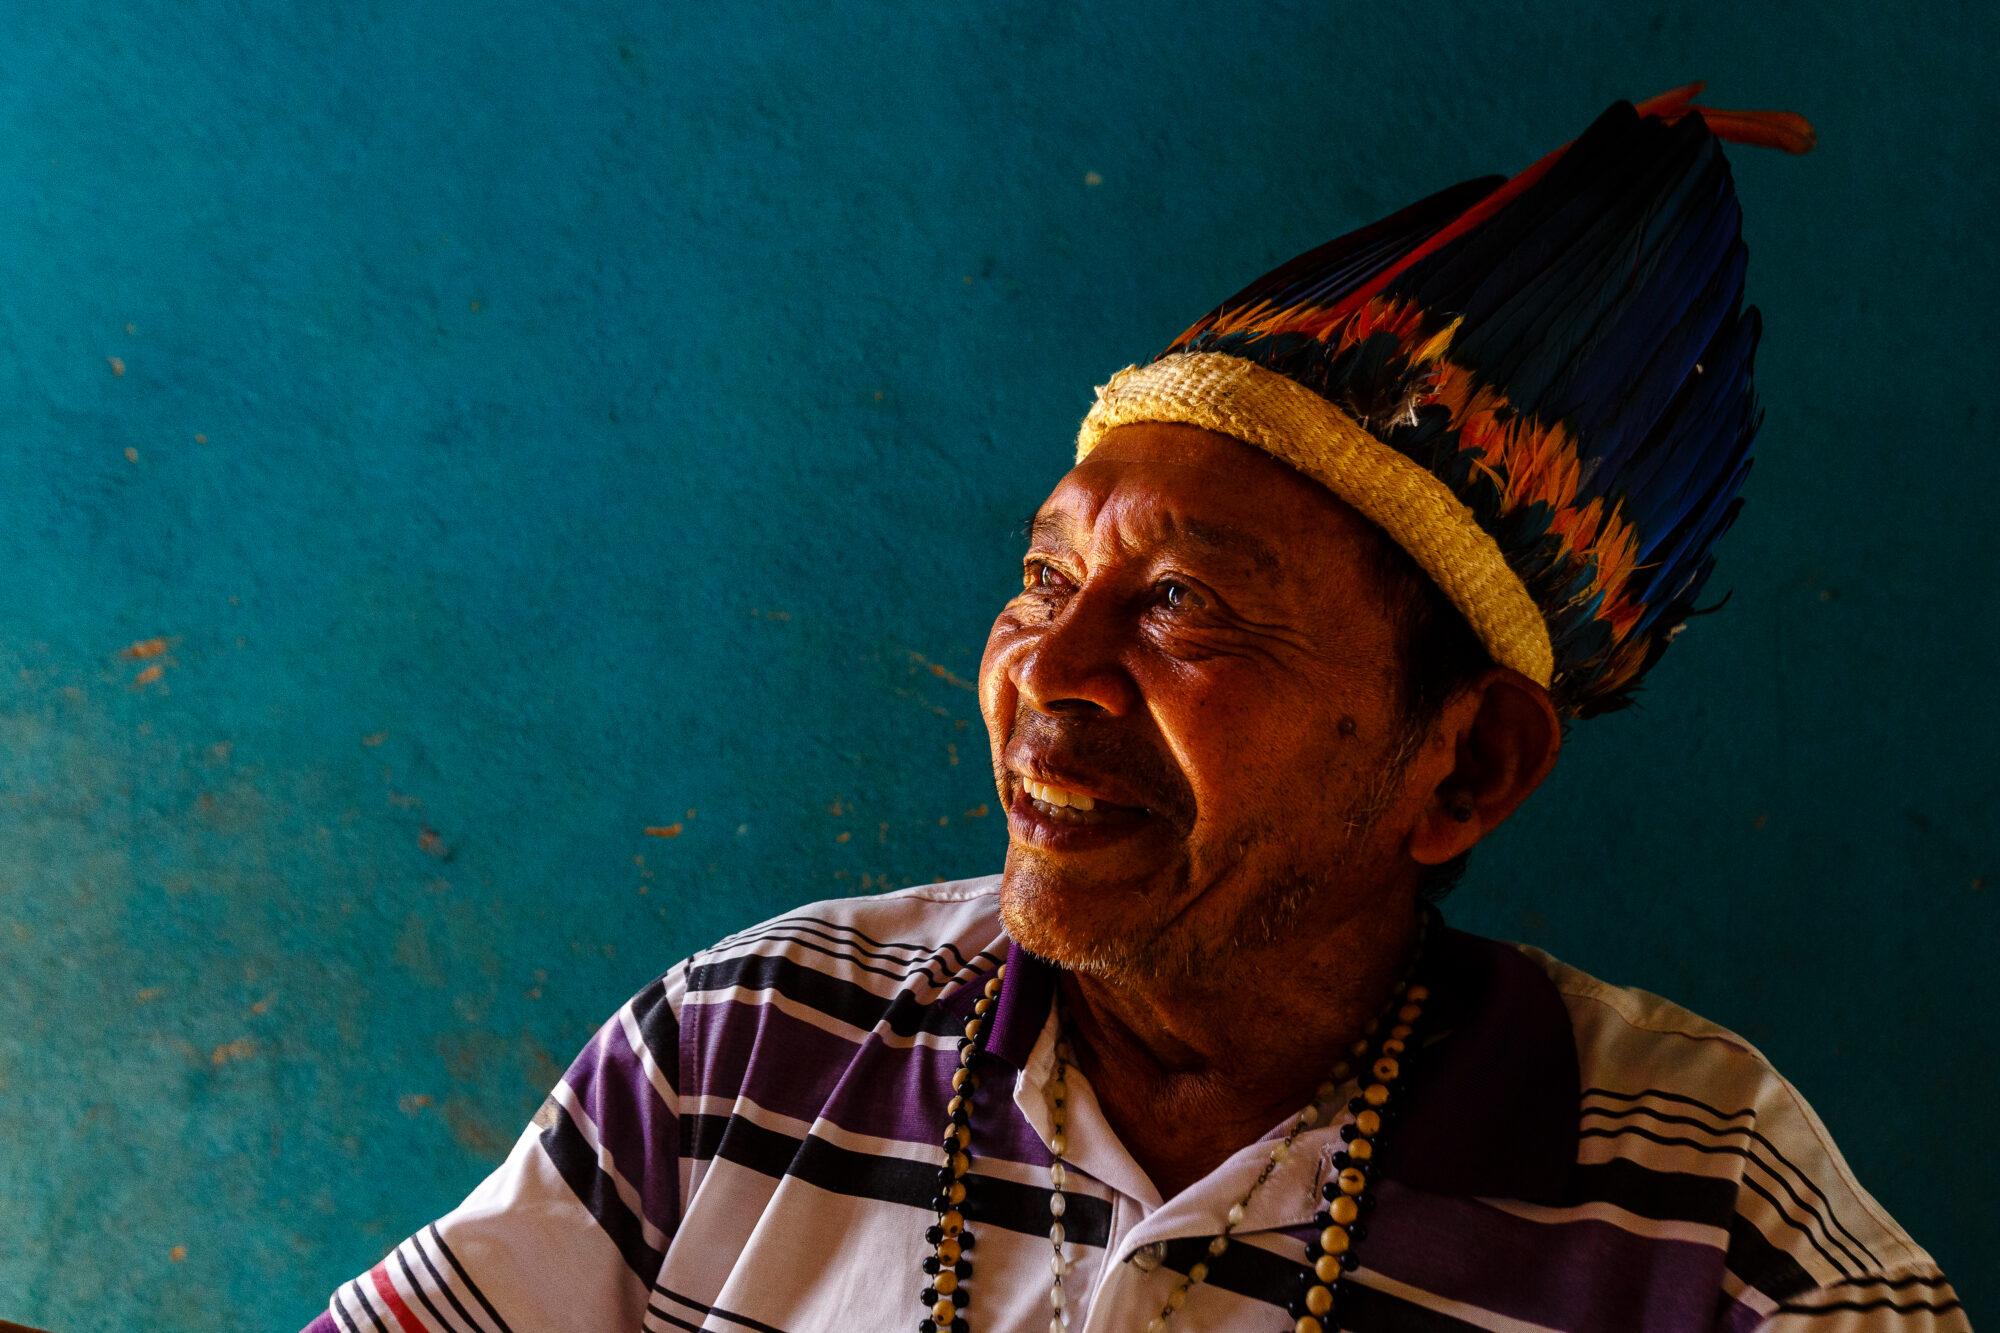 COVID-19 malaria i Amazonas Brasilien